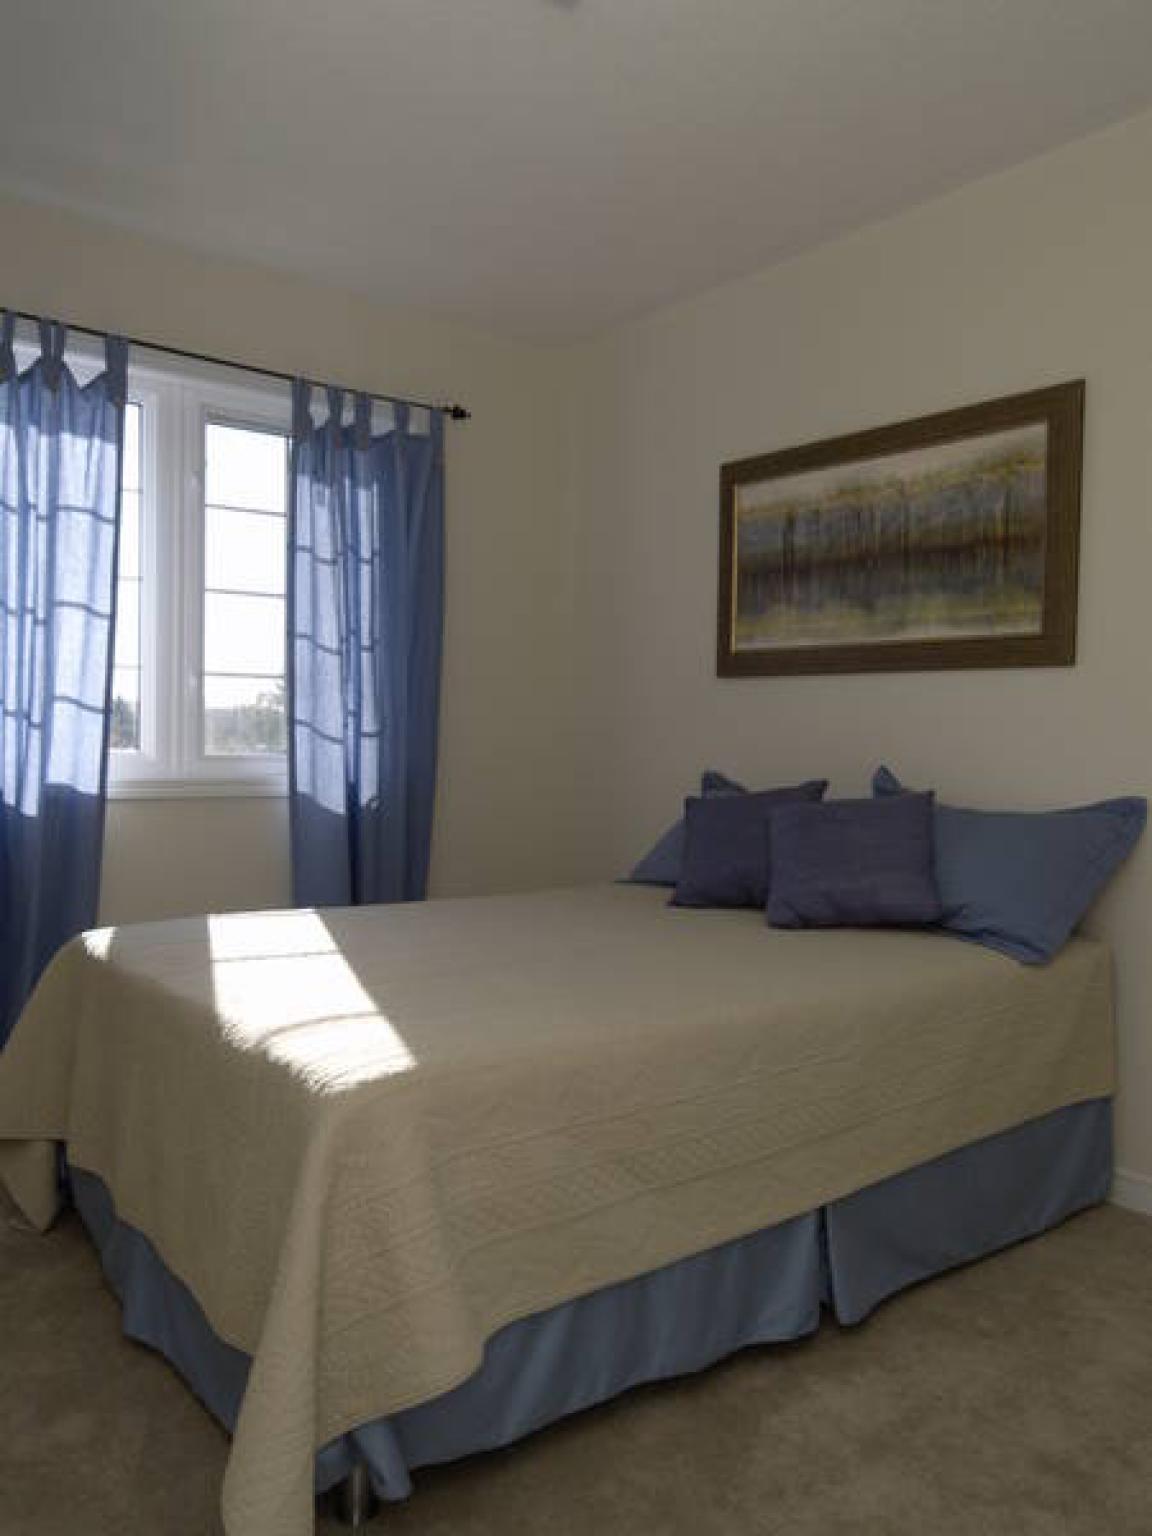 Room For Rent In Etobicoke Ontario